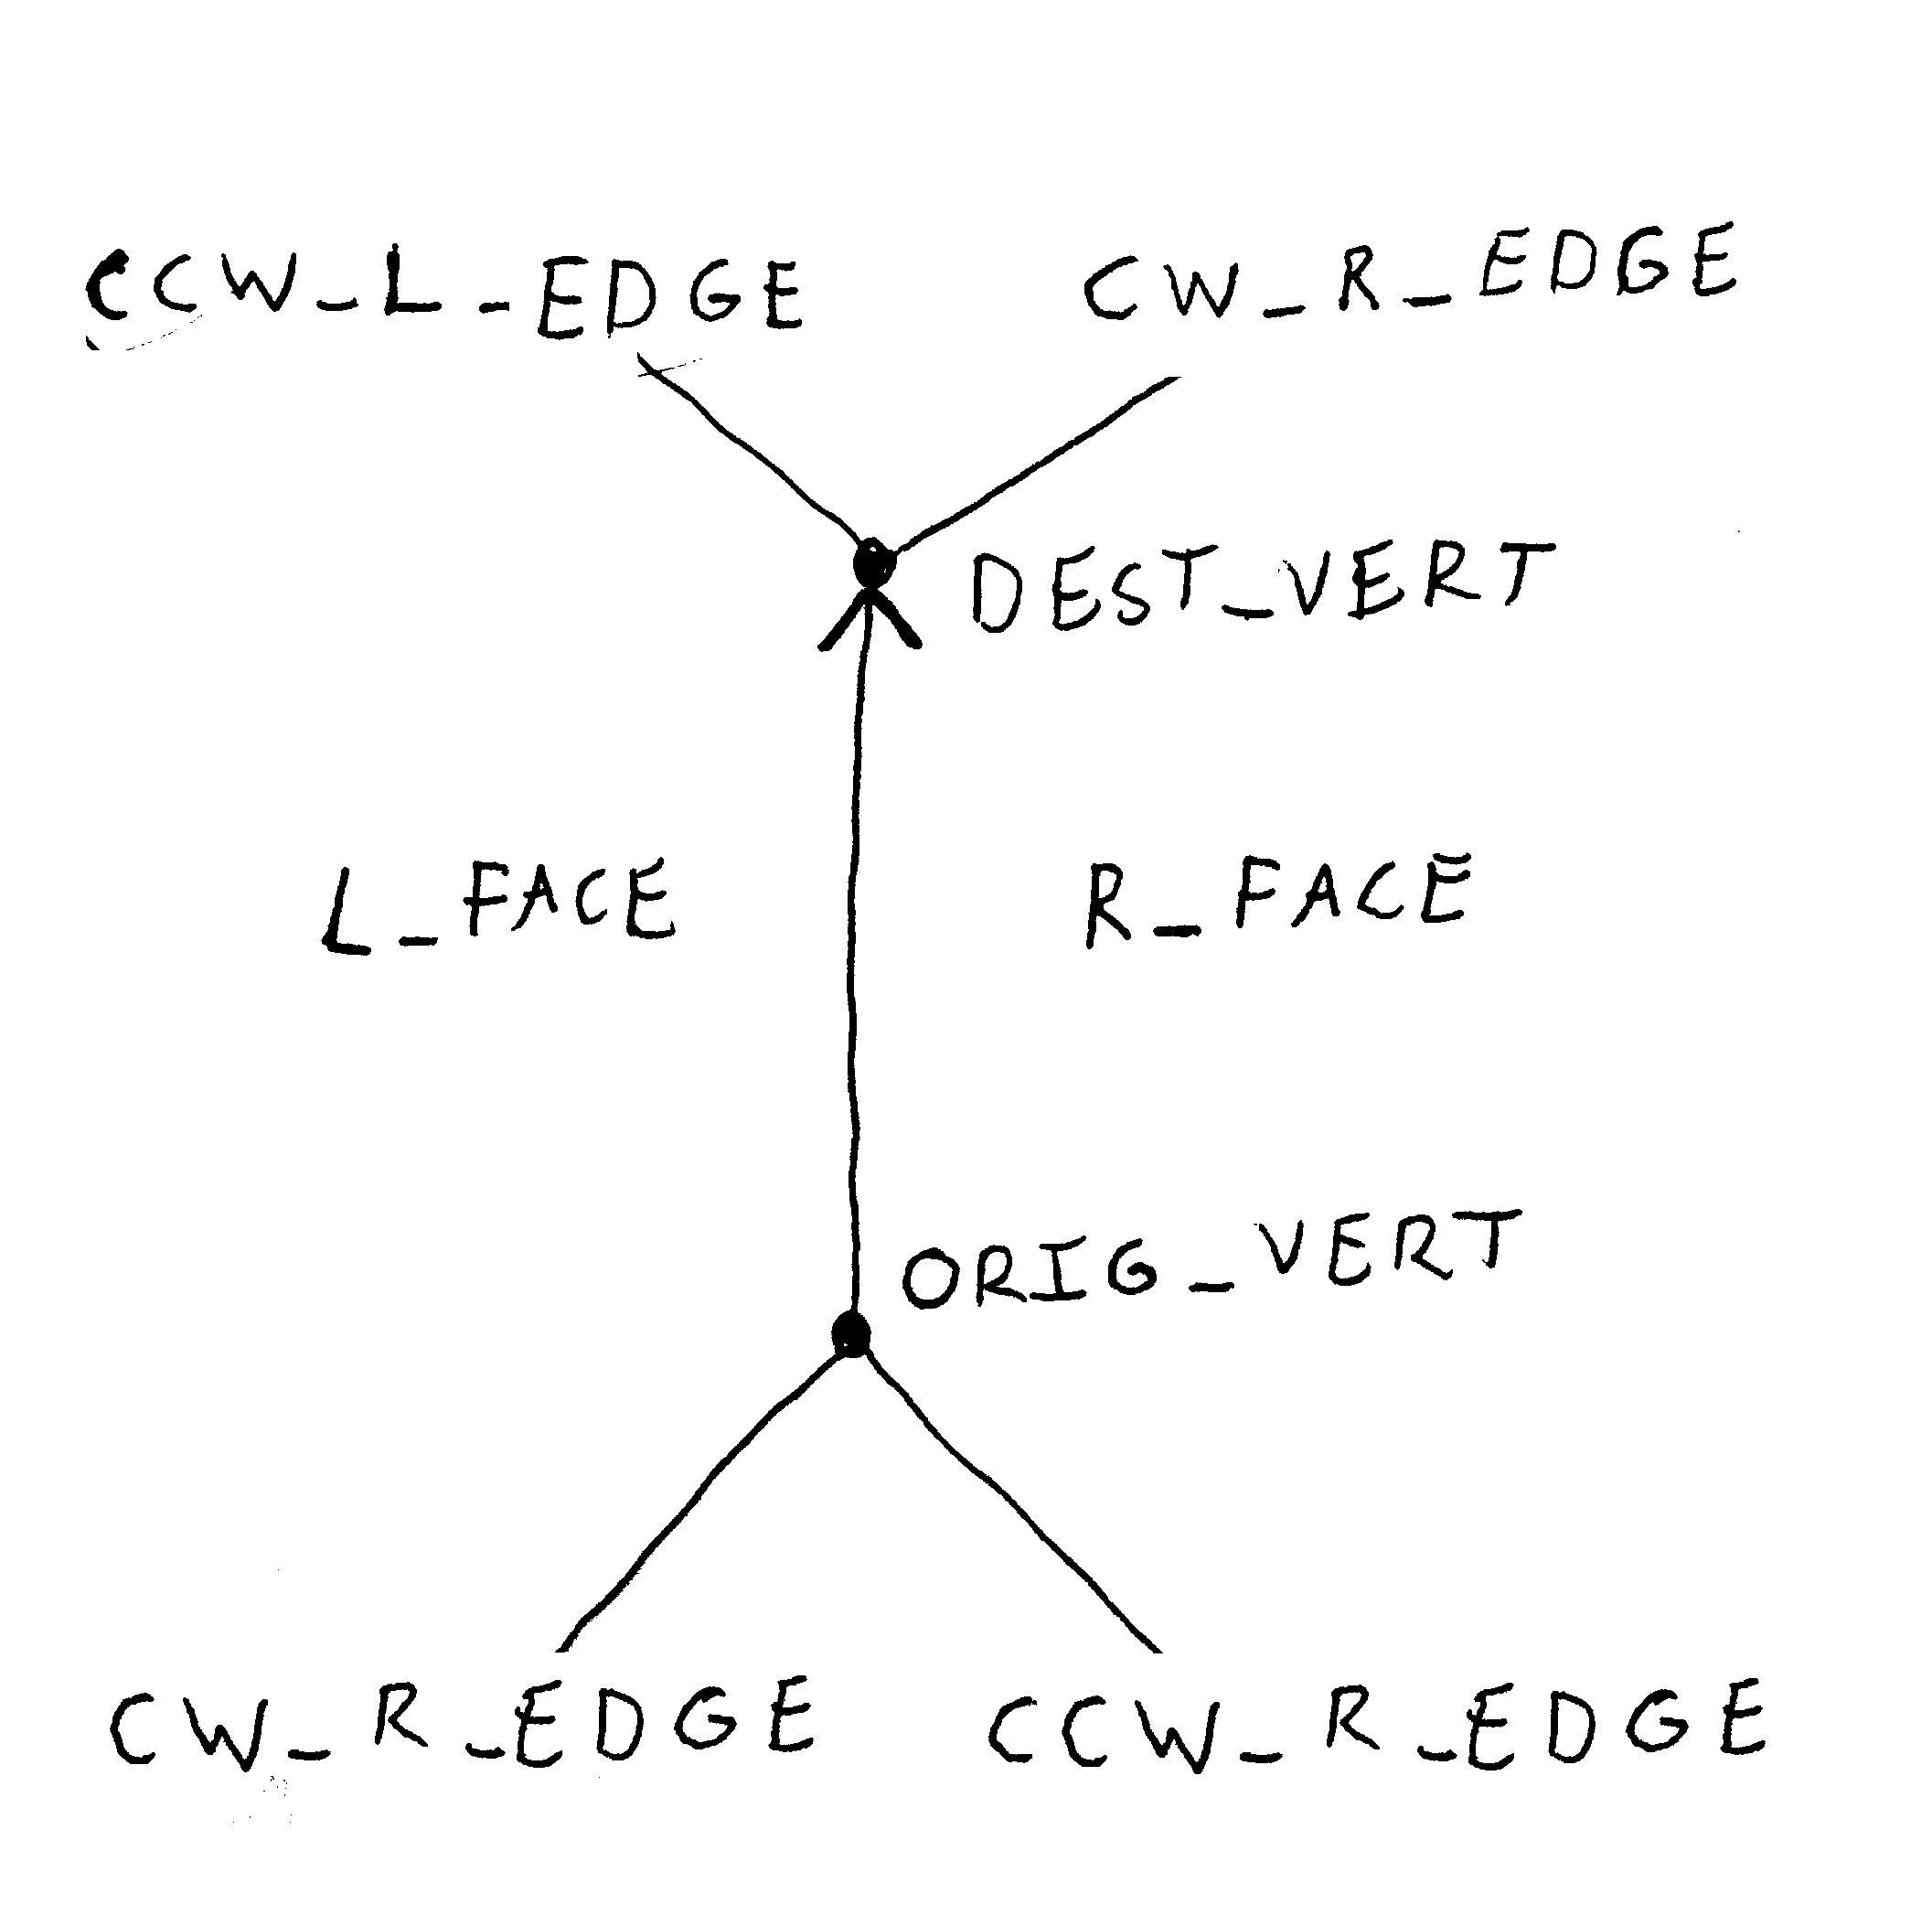 Winged edge - Wikipedia